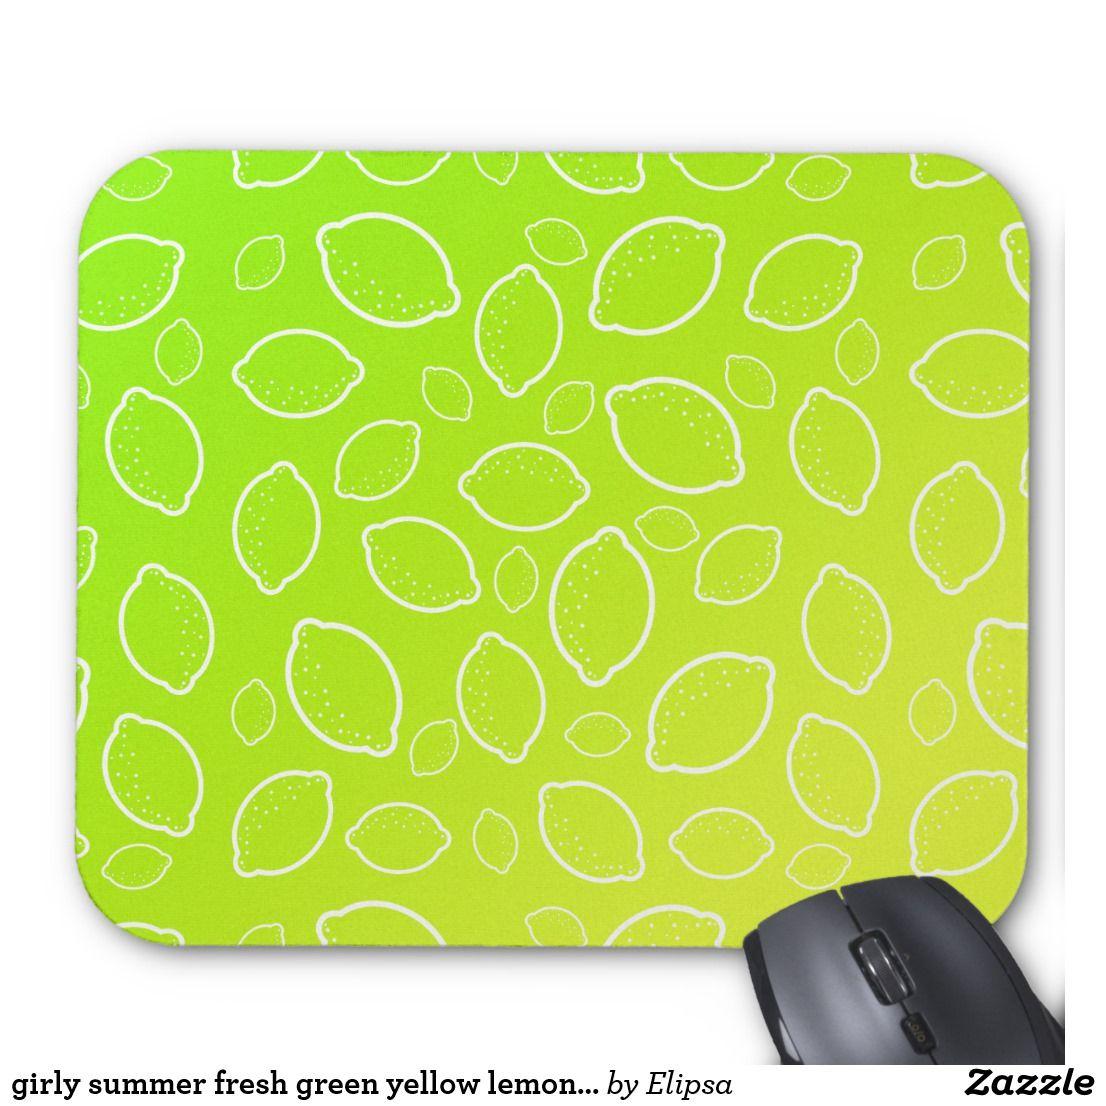 girly summer fresh green yellow lemon pattern mouse pad